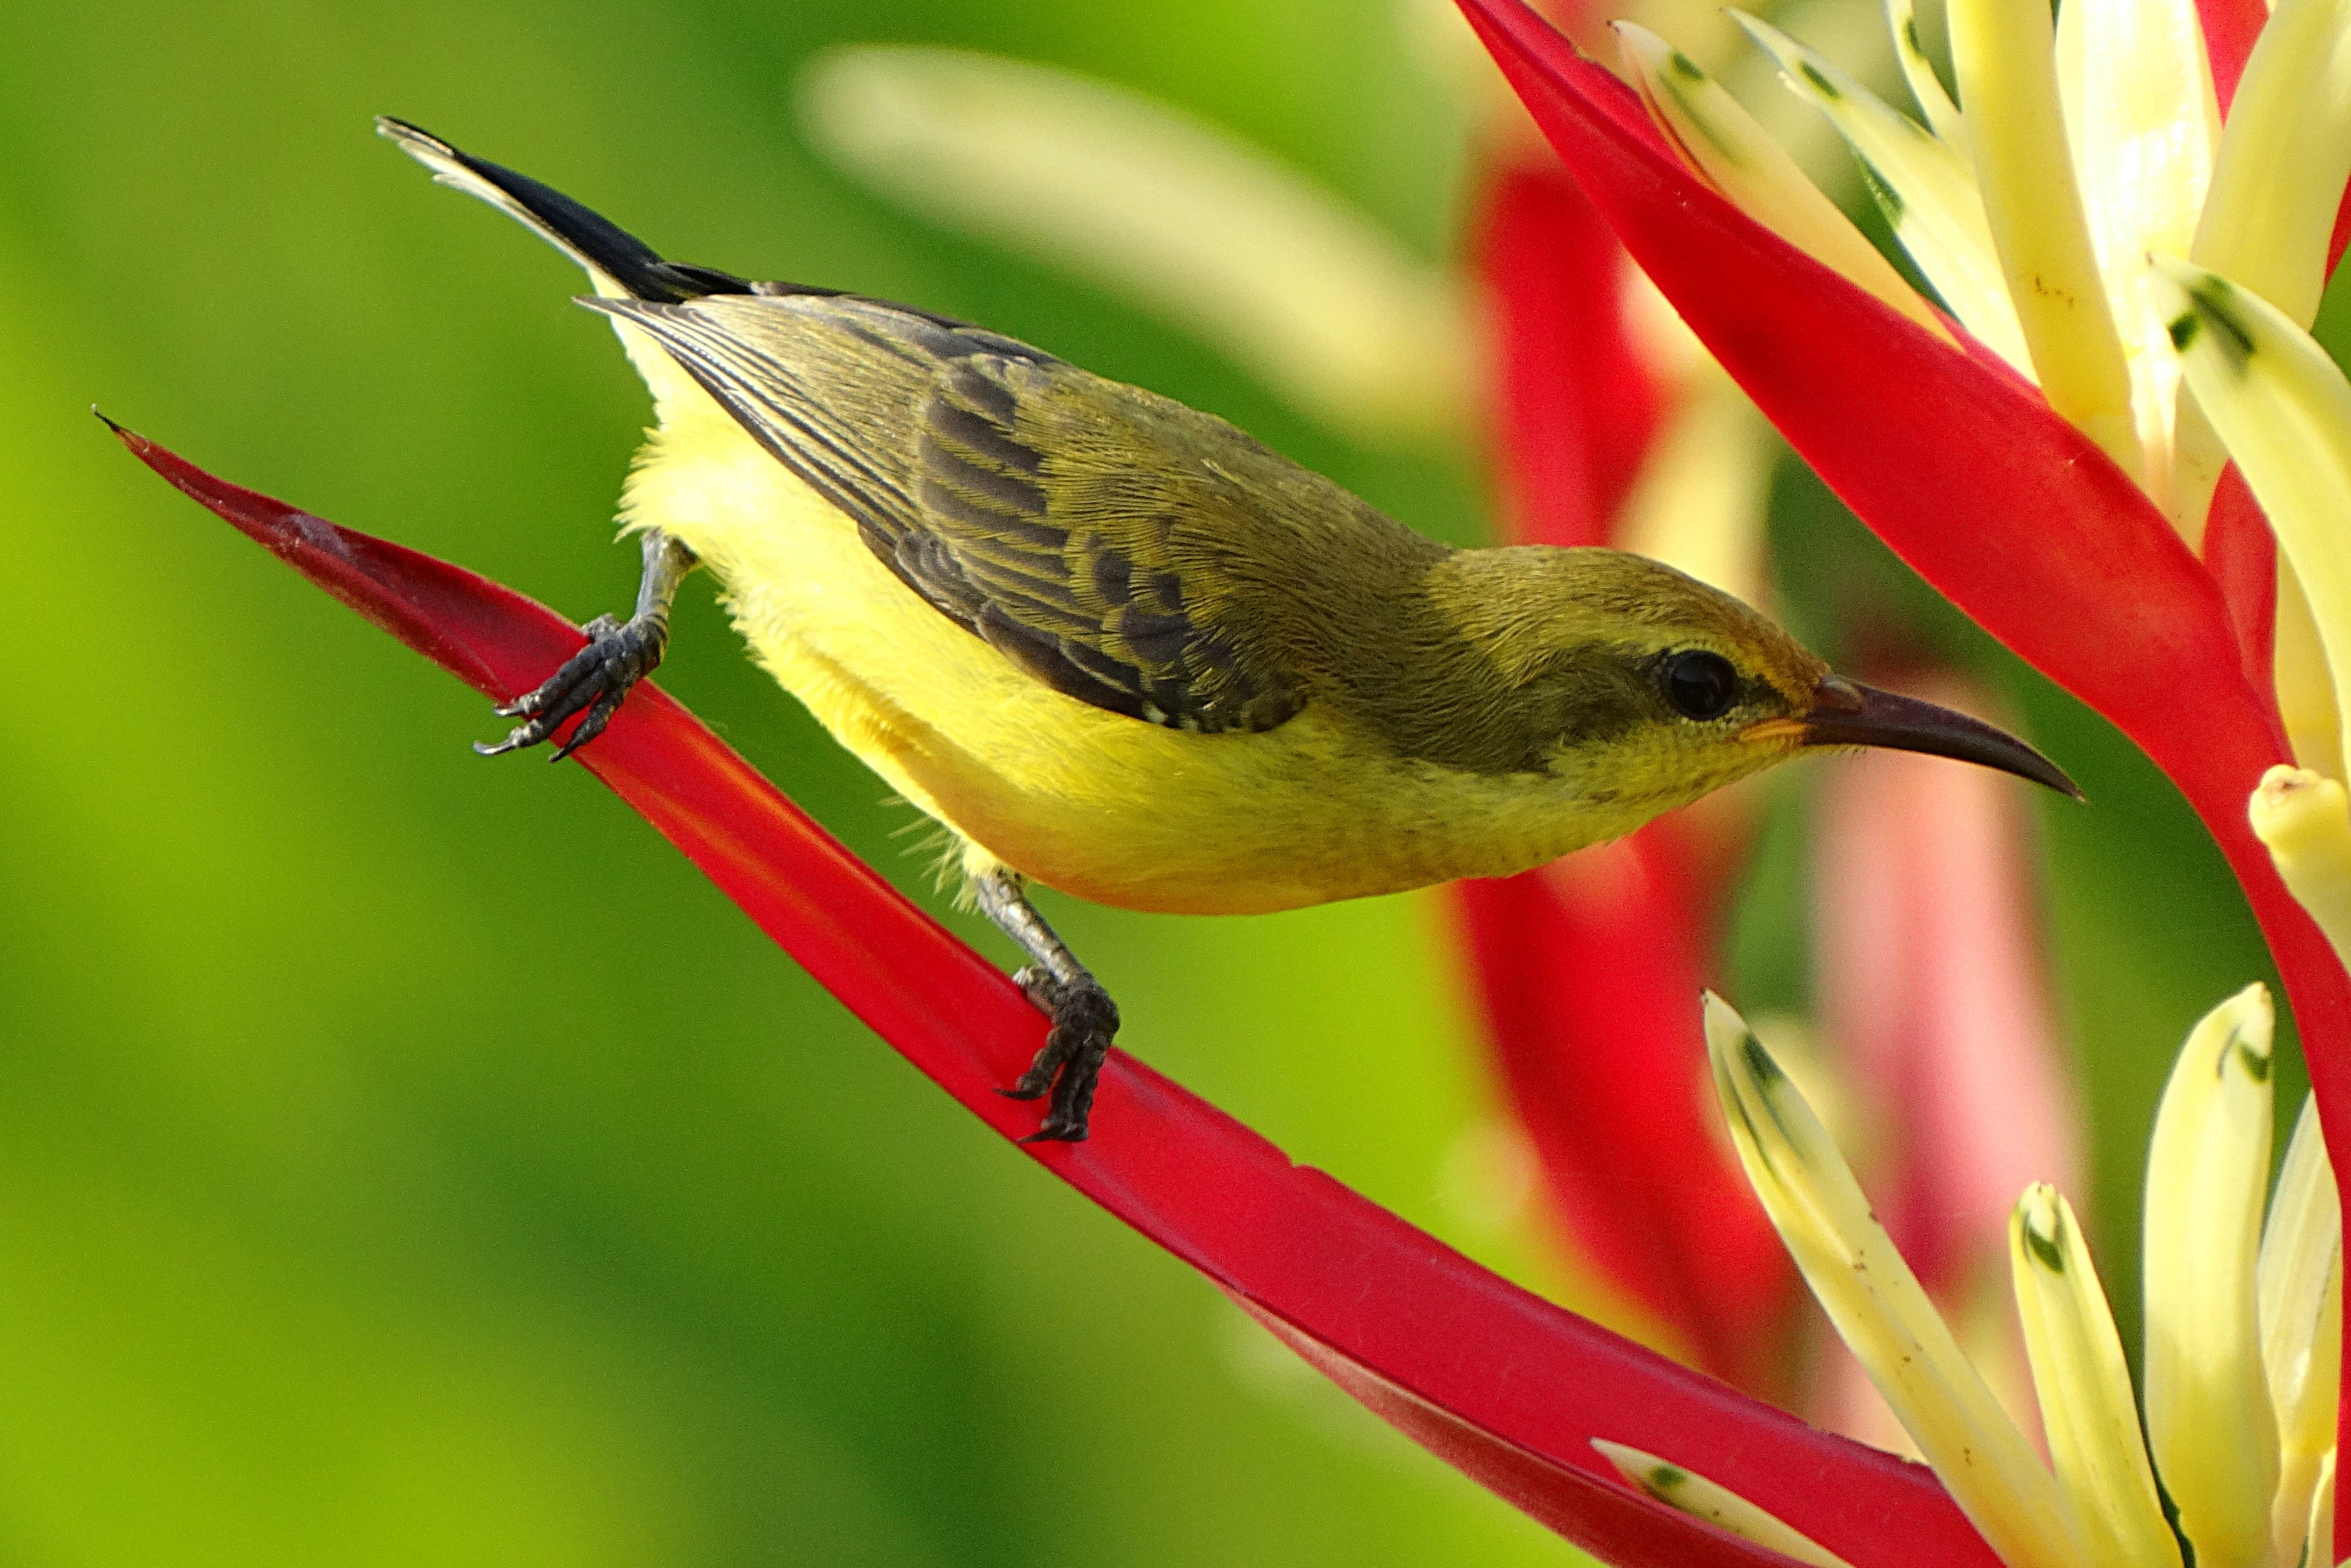 Selective Focus Photography of Black Green and Yellow Long Beaked Bird